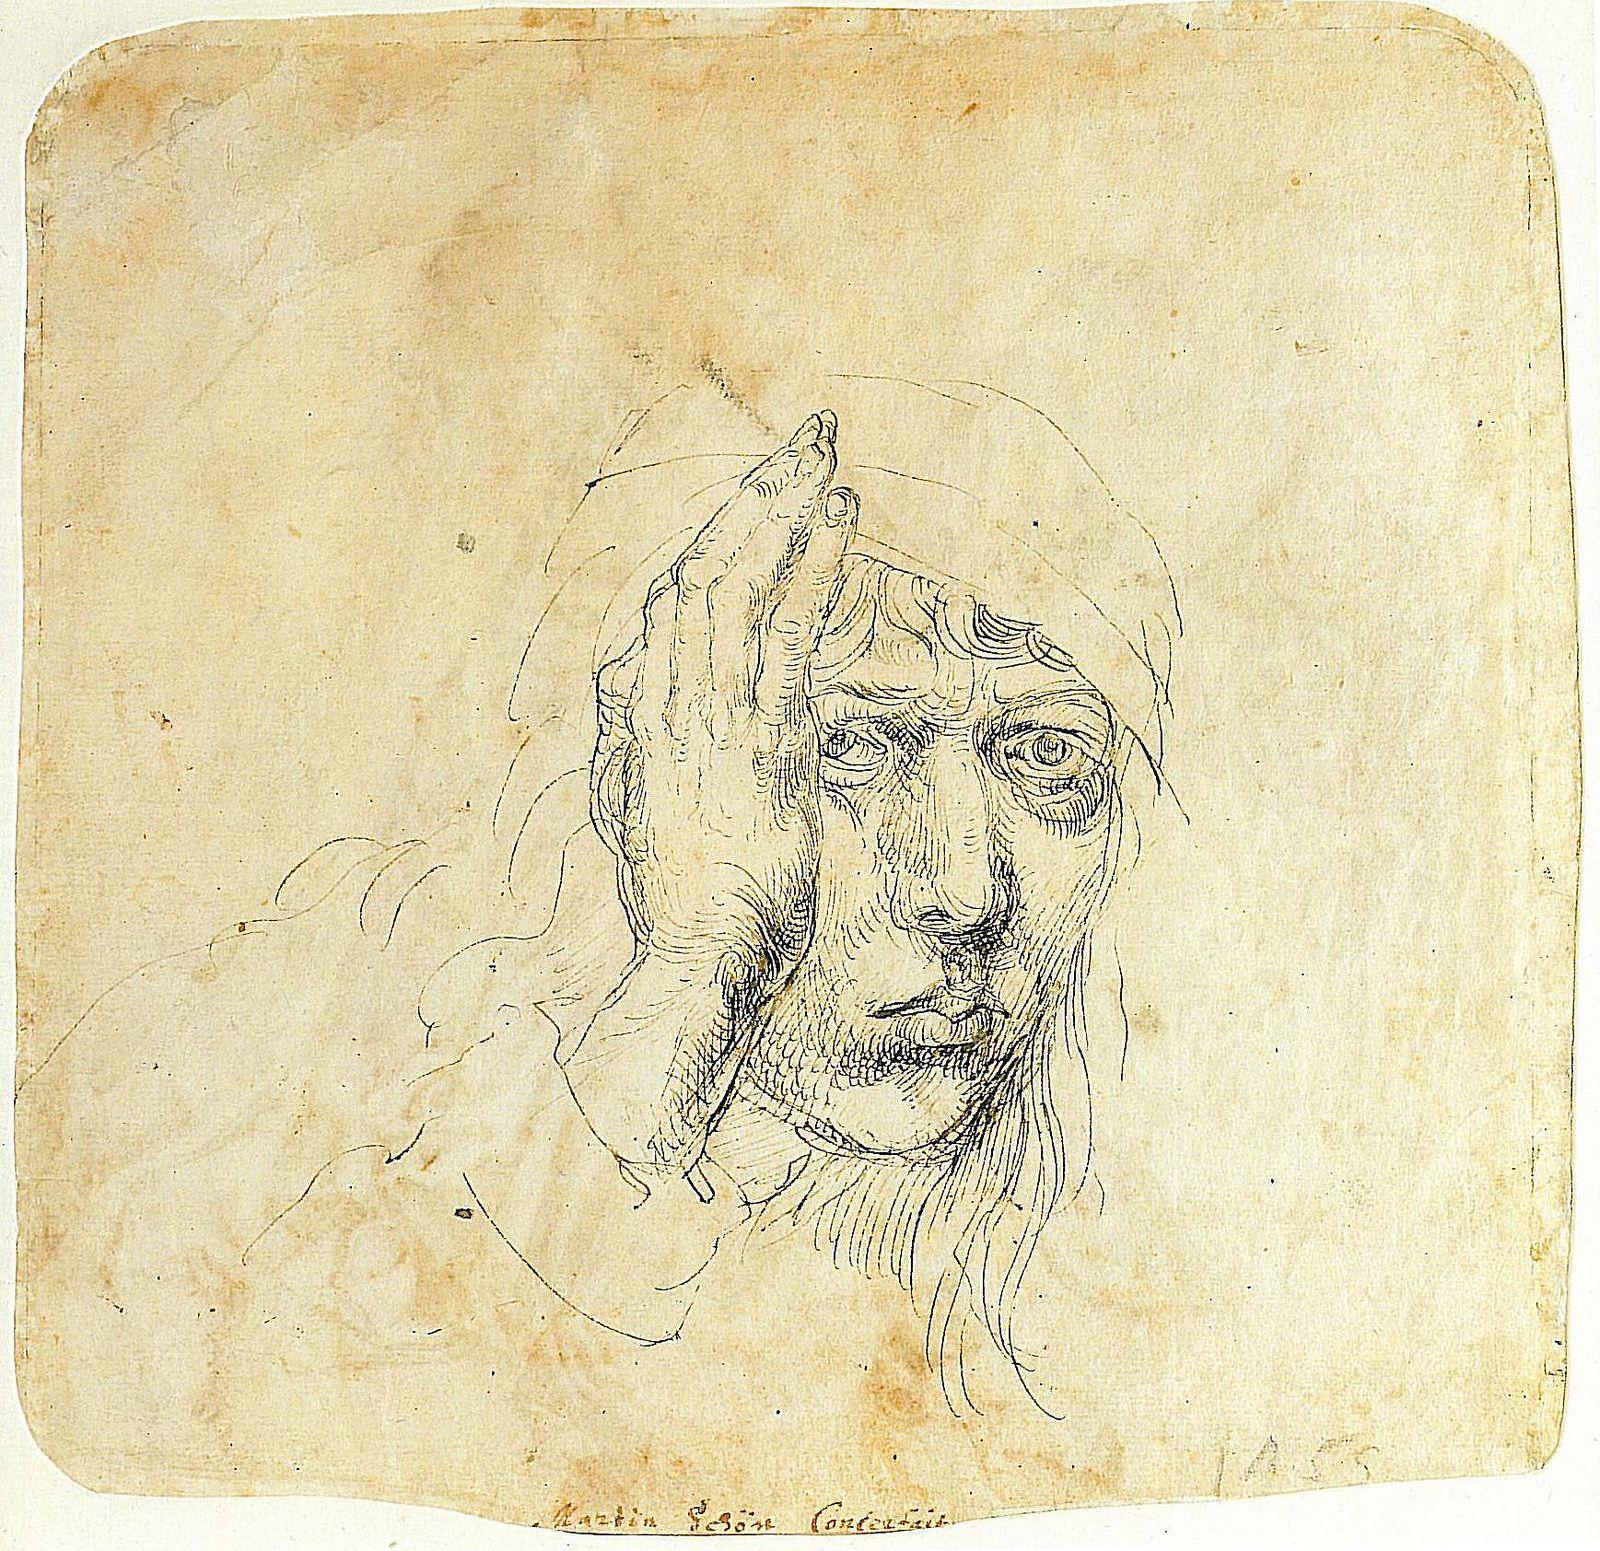 Dürer : Self-portrait with a wrap or bandage [1492]